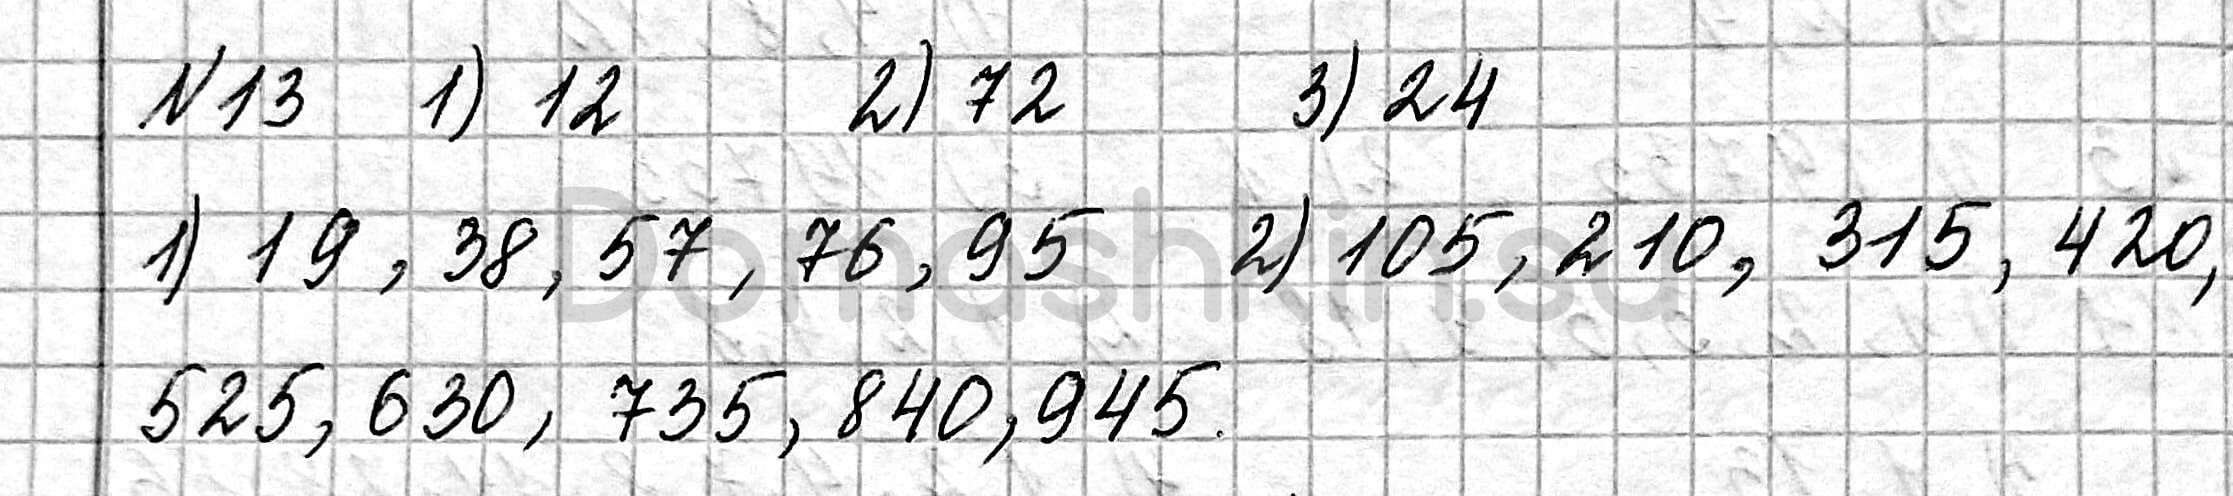 Математика 6 класс учебник Мерзляк номер 13 решение